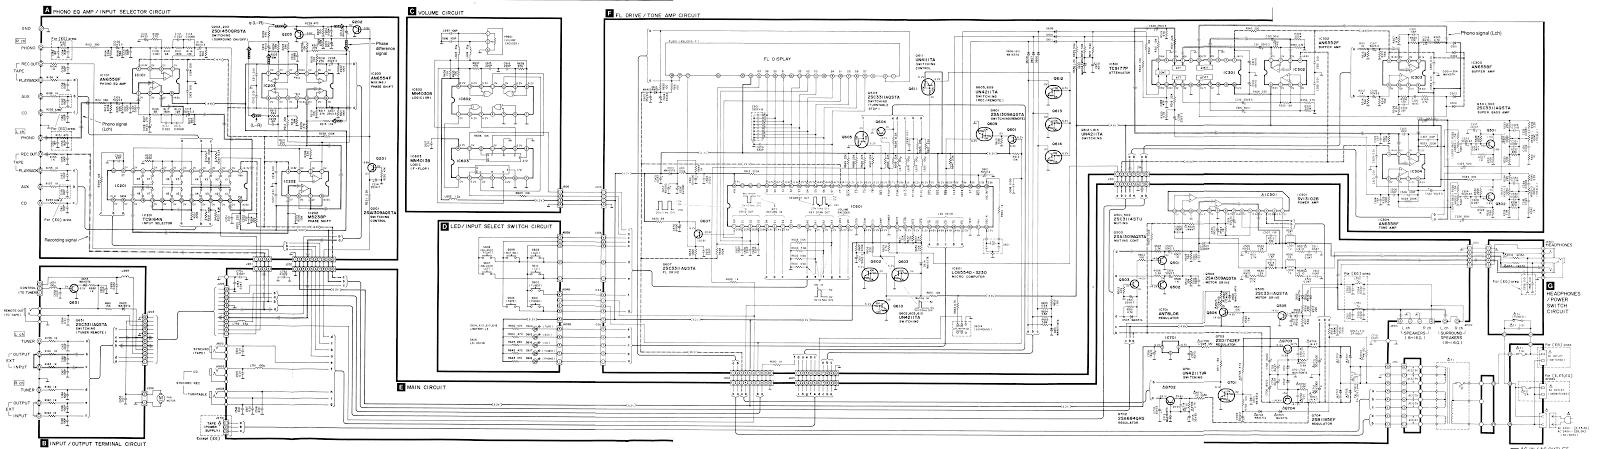 technics sux digital integrated amplifier circuit diagram circuit daigram split